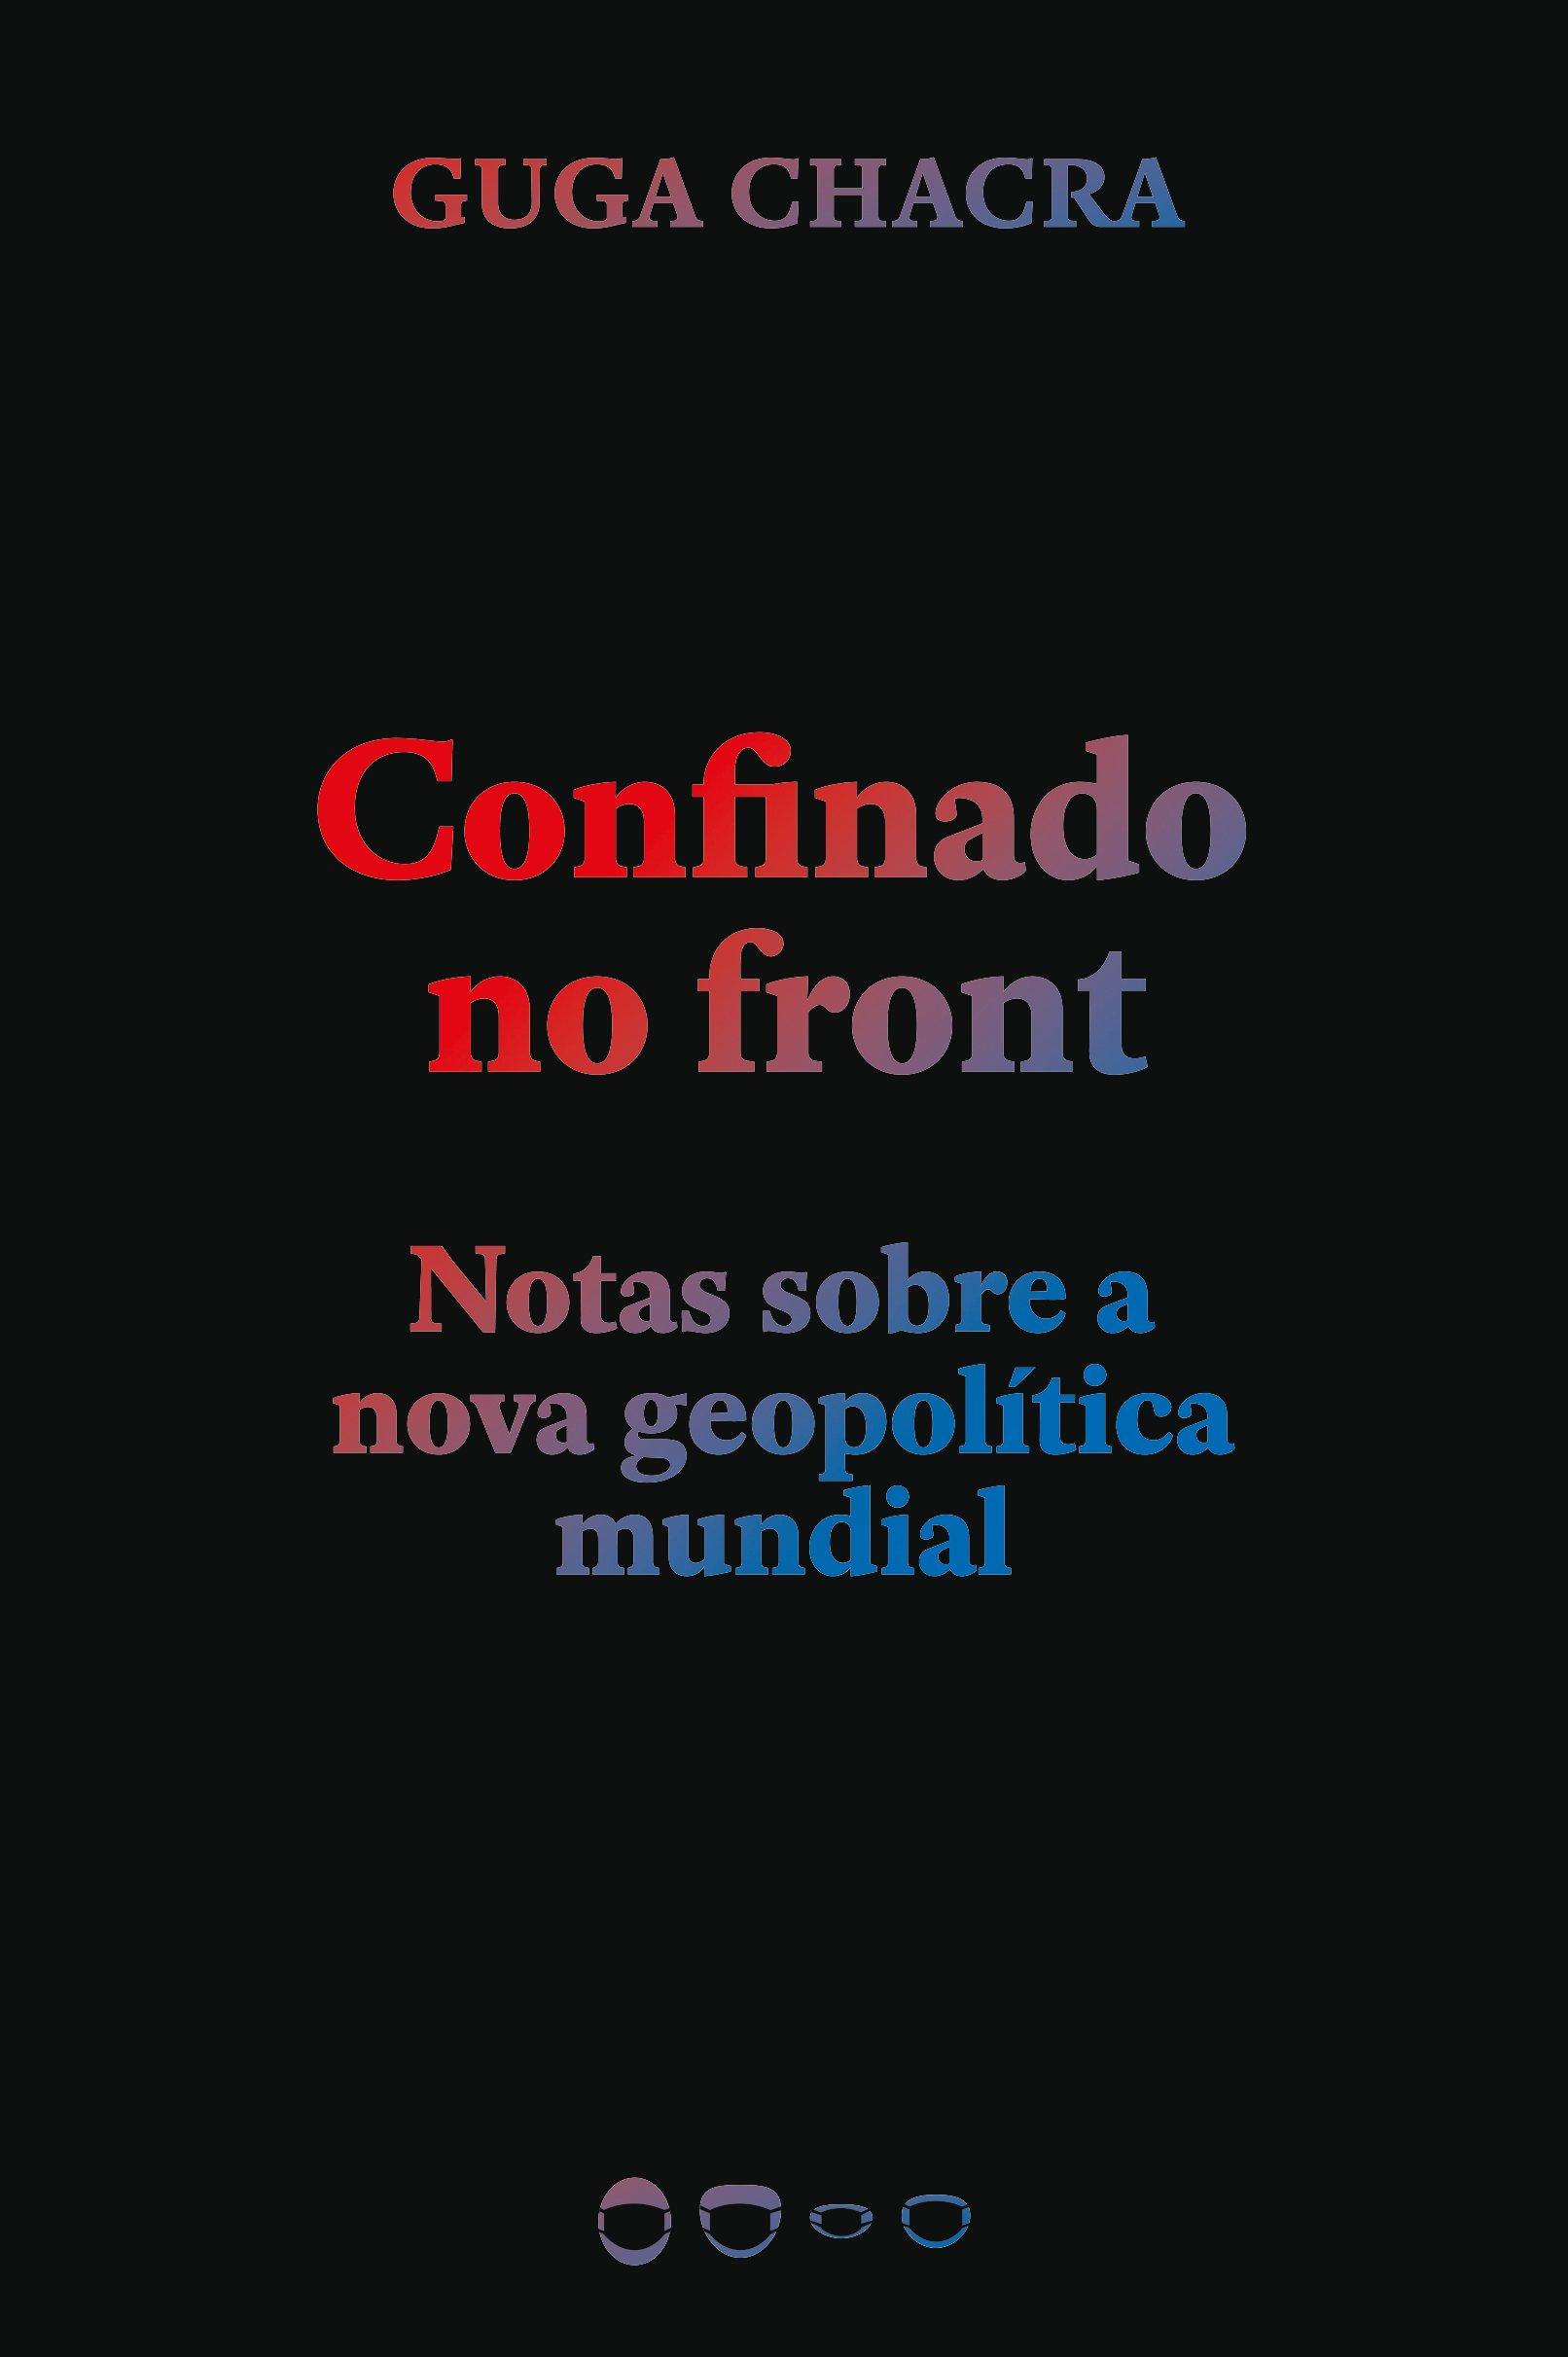 Confinado no front. Notas sobre a nova geopolítica mundial, livro de Guga Chacra